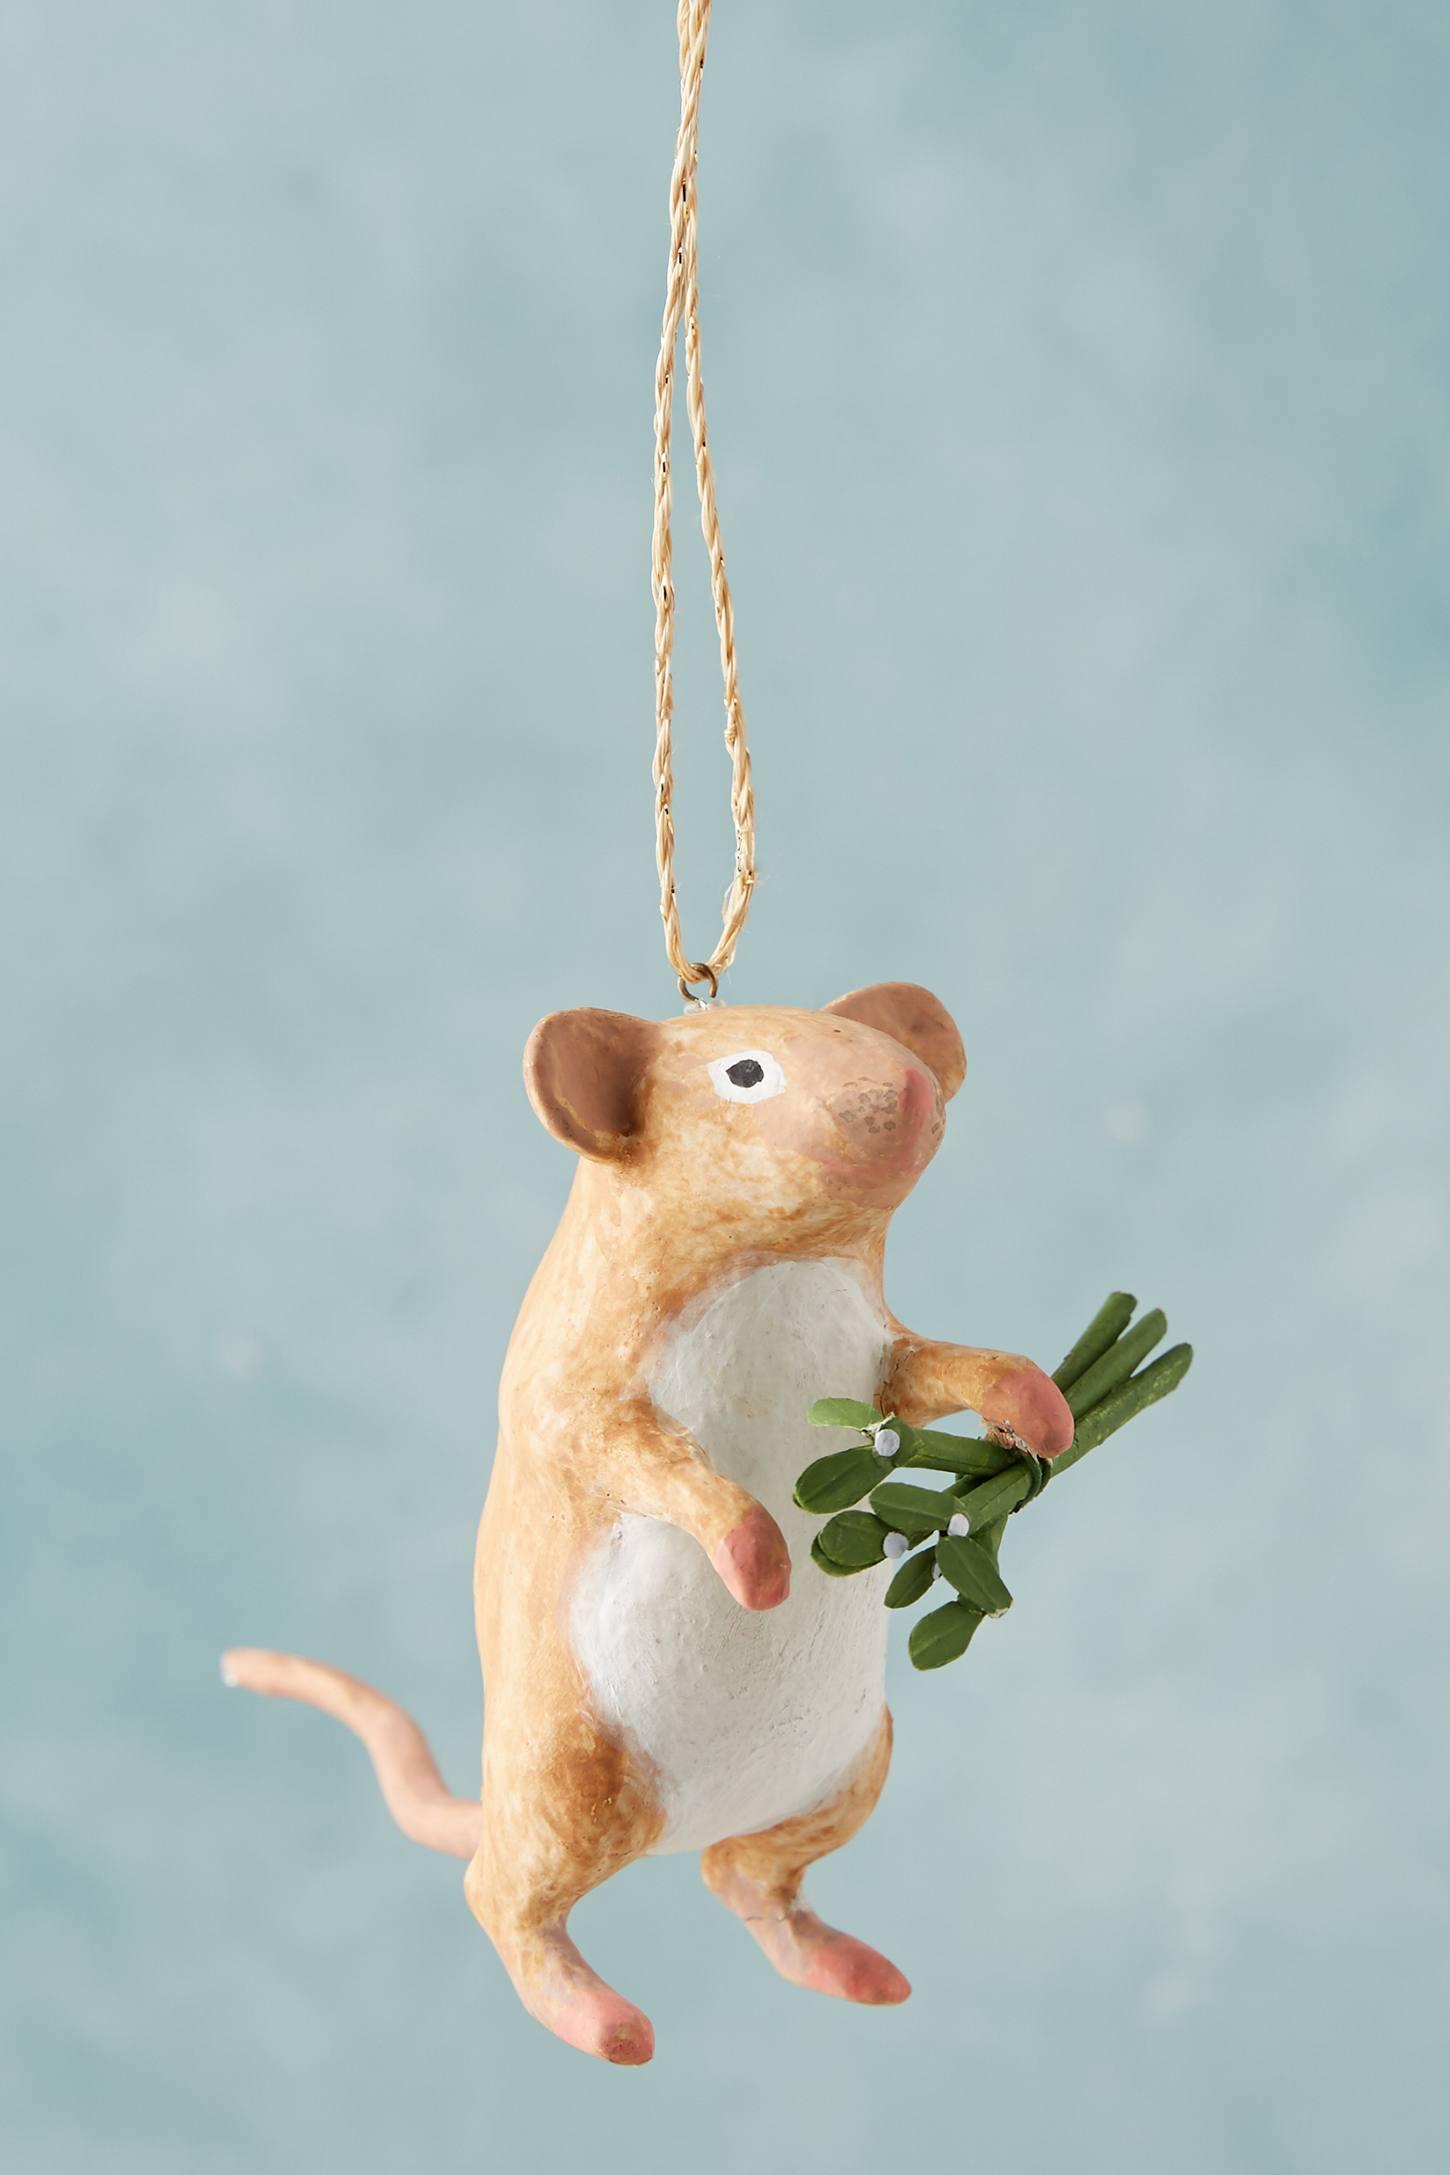 Glass Pineapple Ornament Mistletoe Mouse Ornament